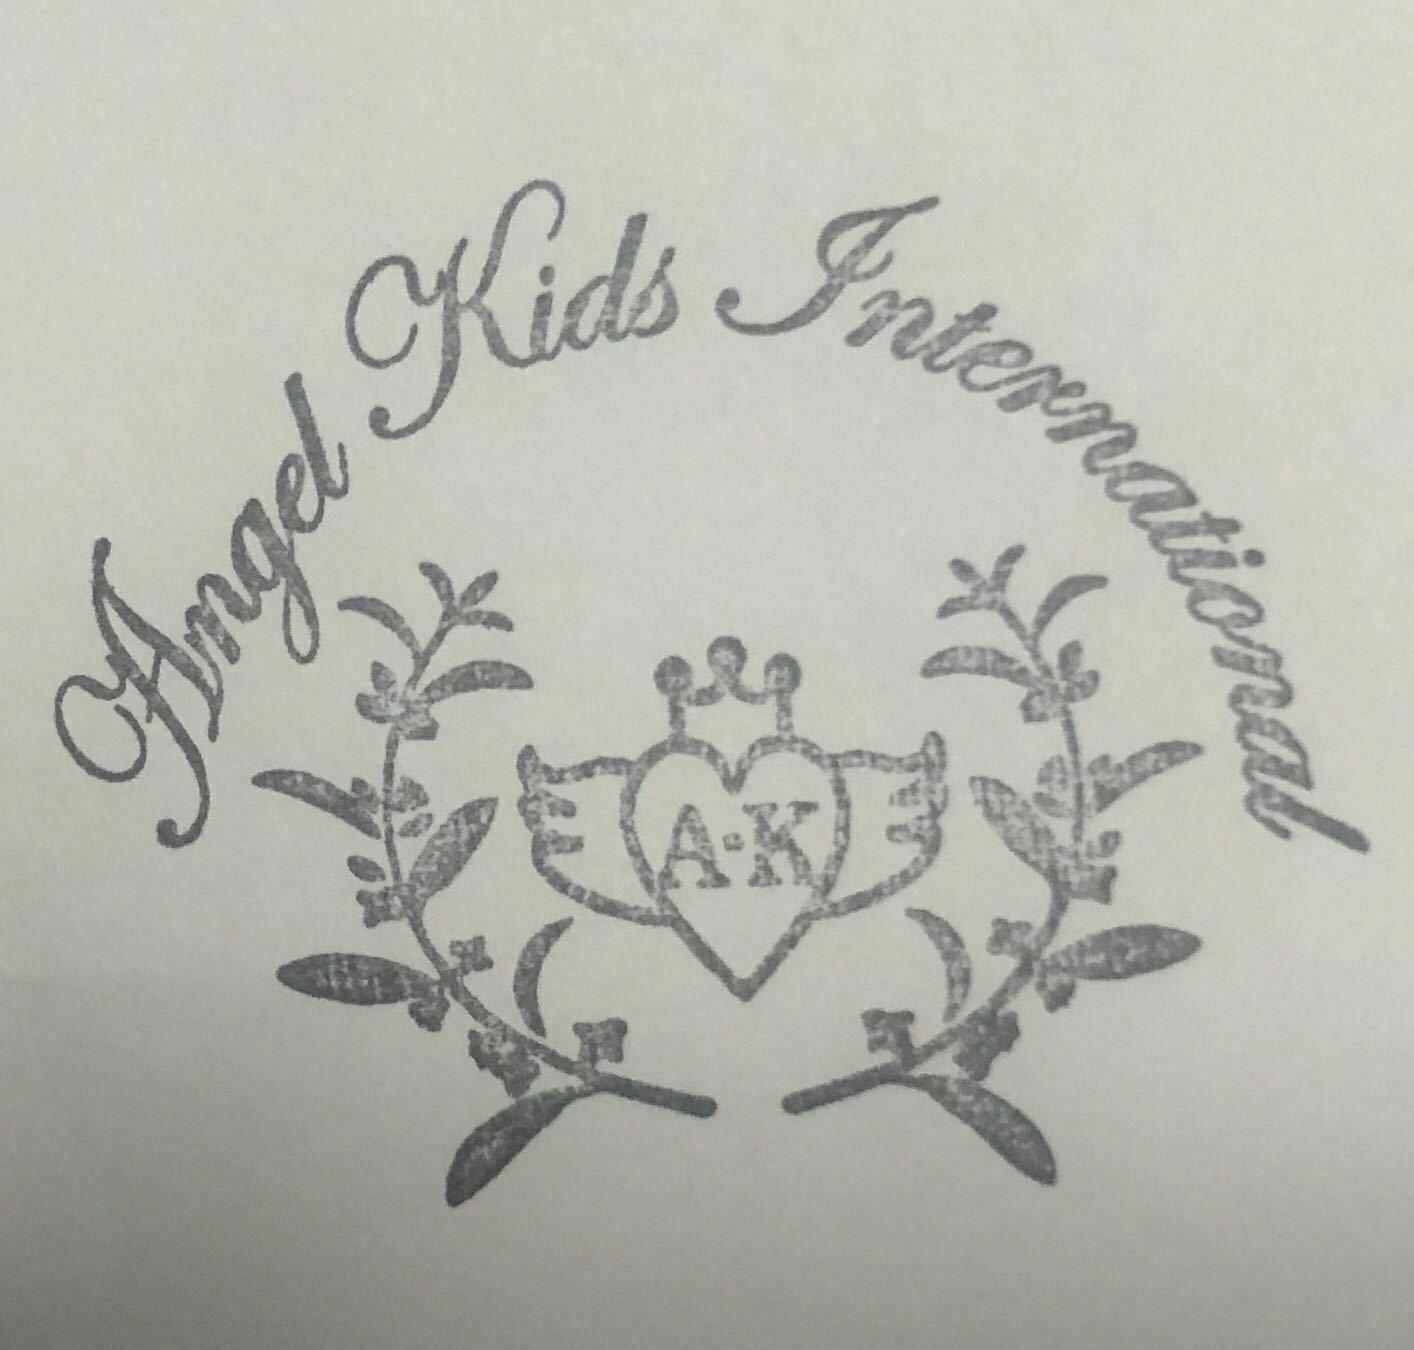 Angel Kids International